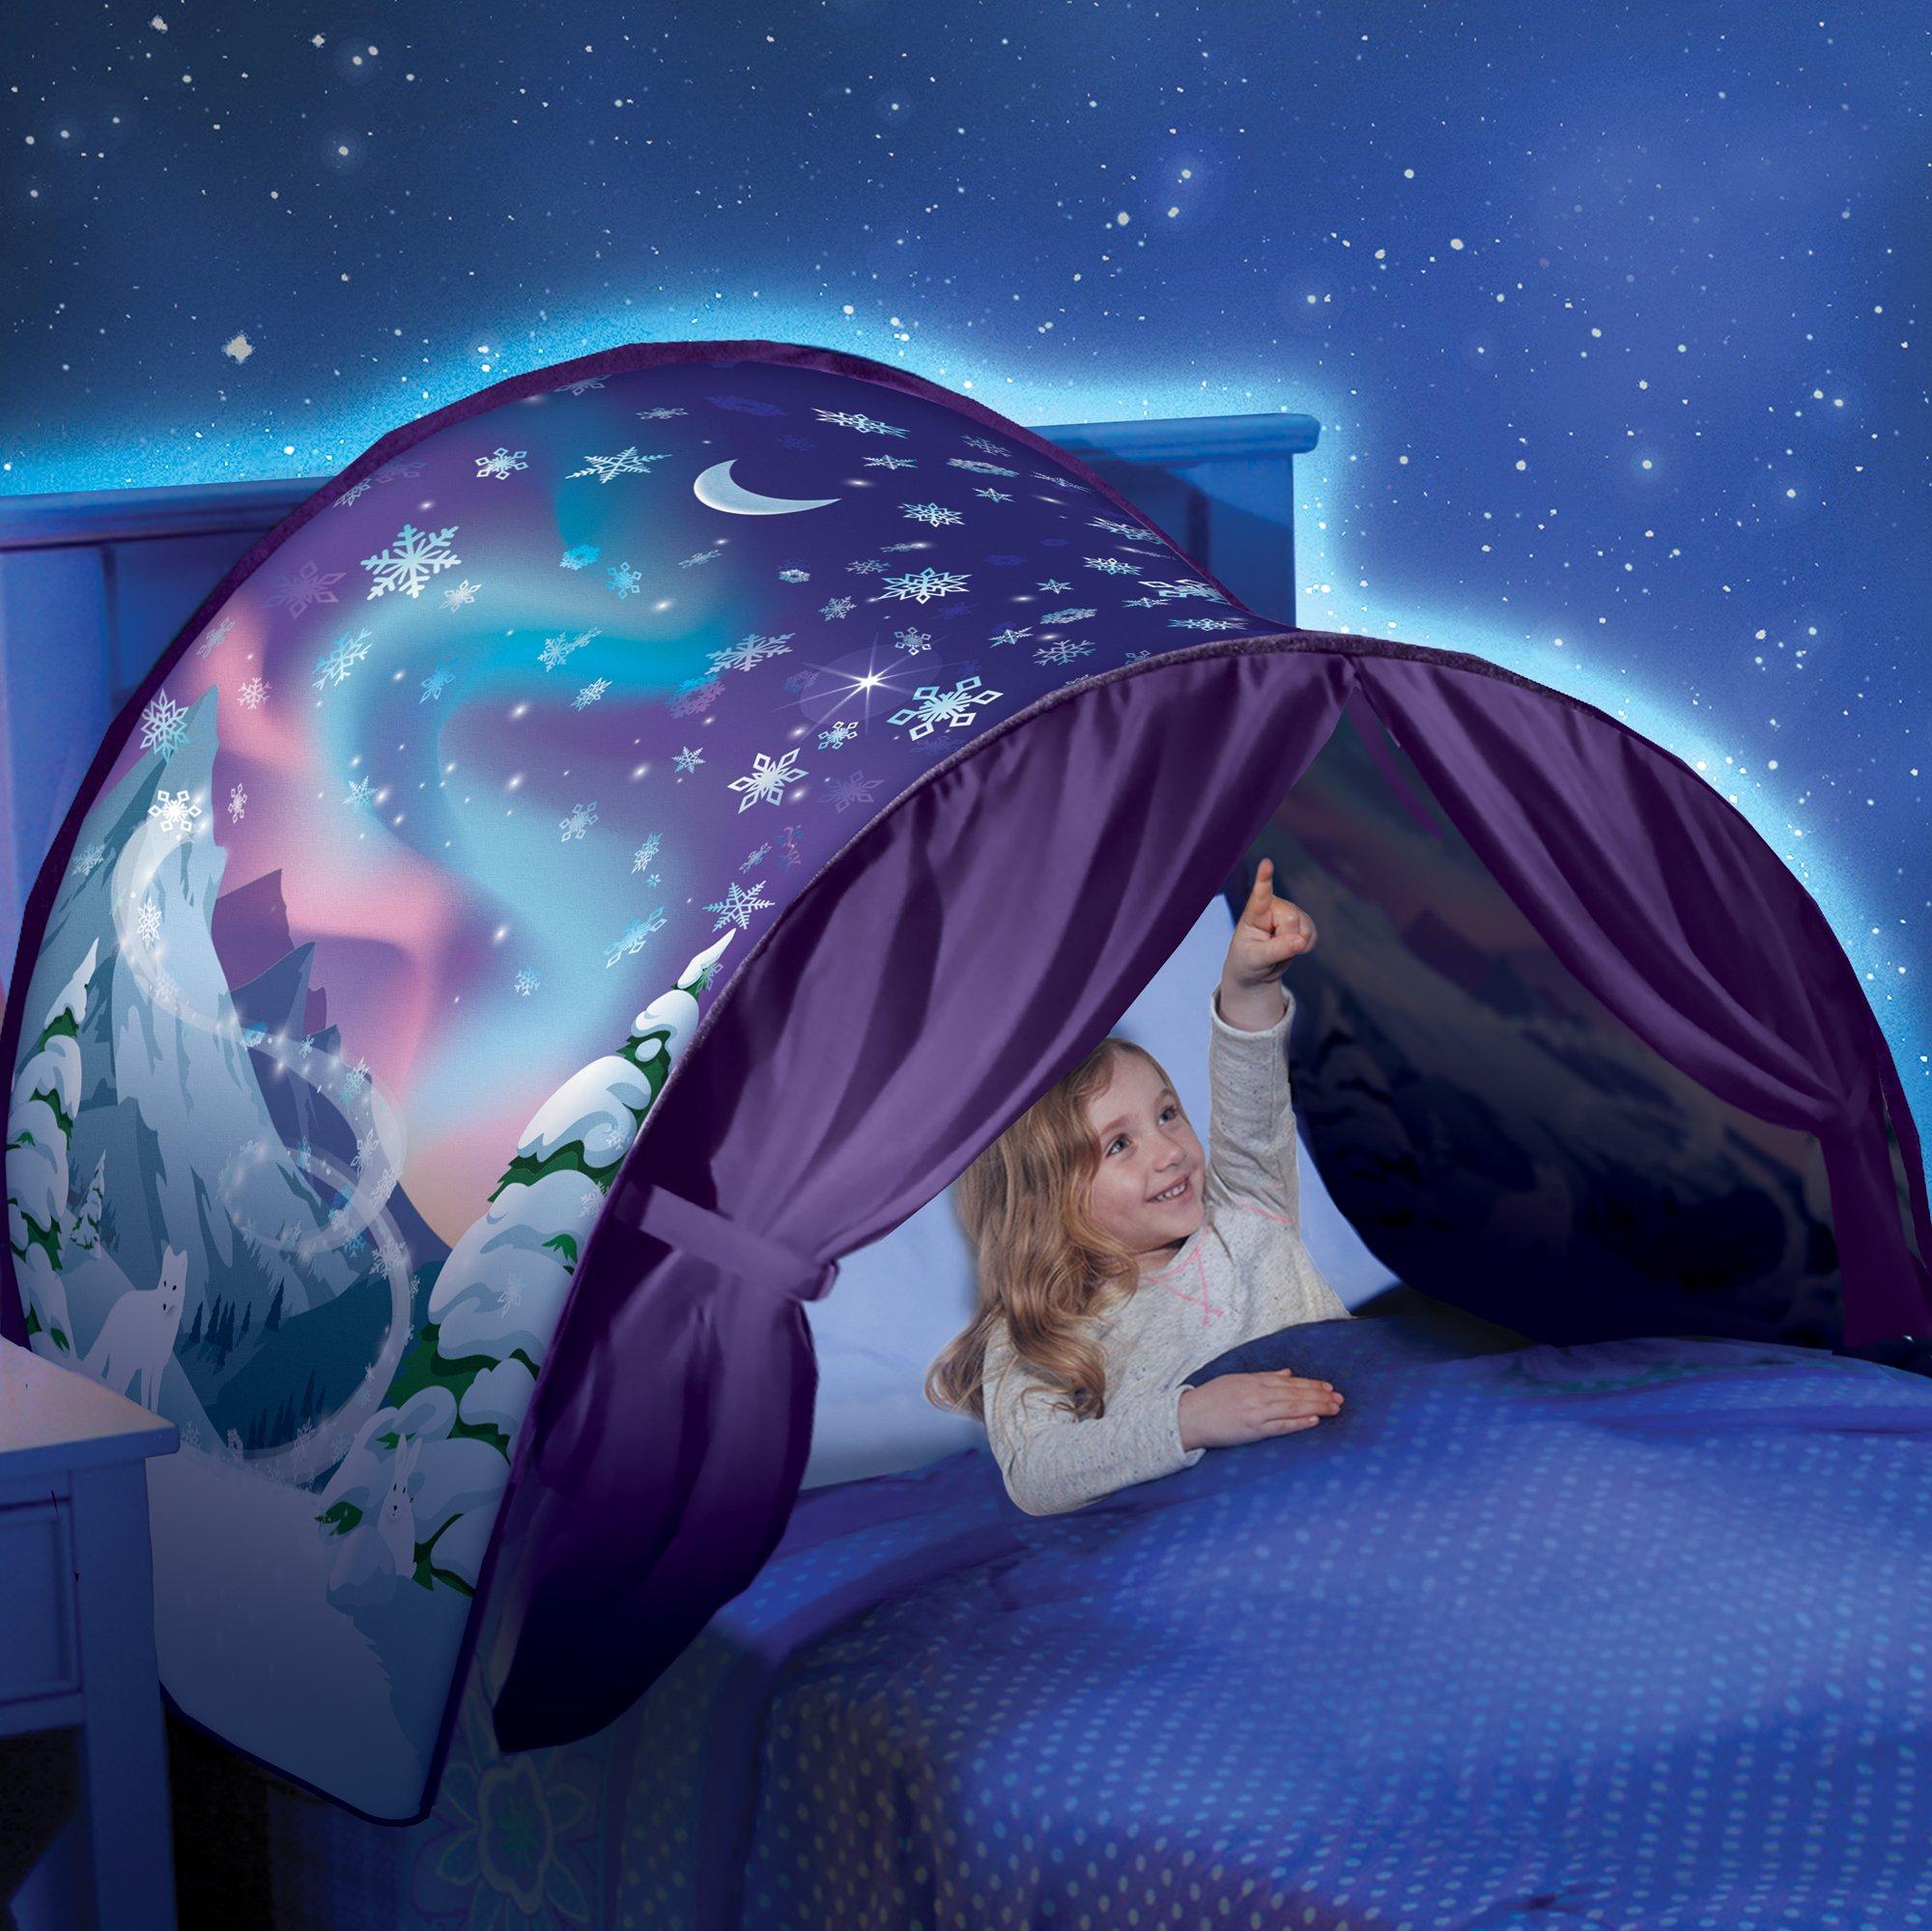 ONTEL Dream Tents Magical Dream World Winter Wonderland & Amazon.com : Magical Dream Tent Portable Kids Pop Up Bed Tent ...